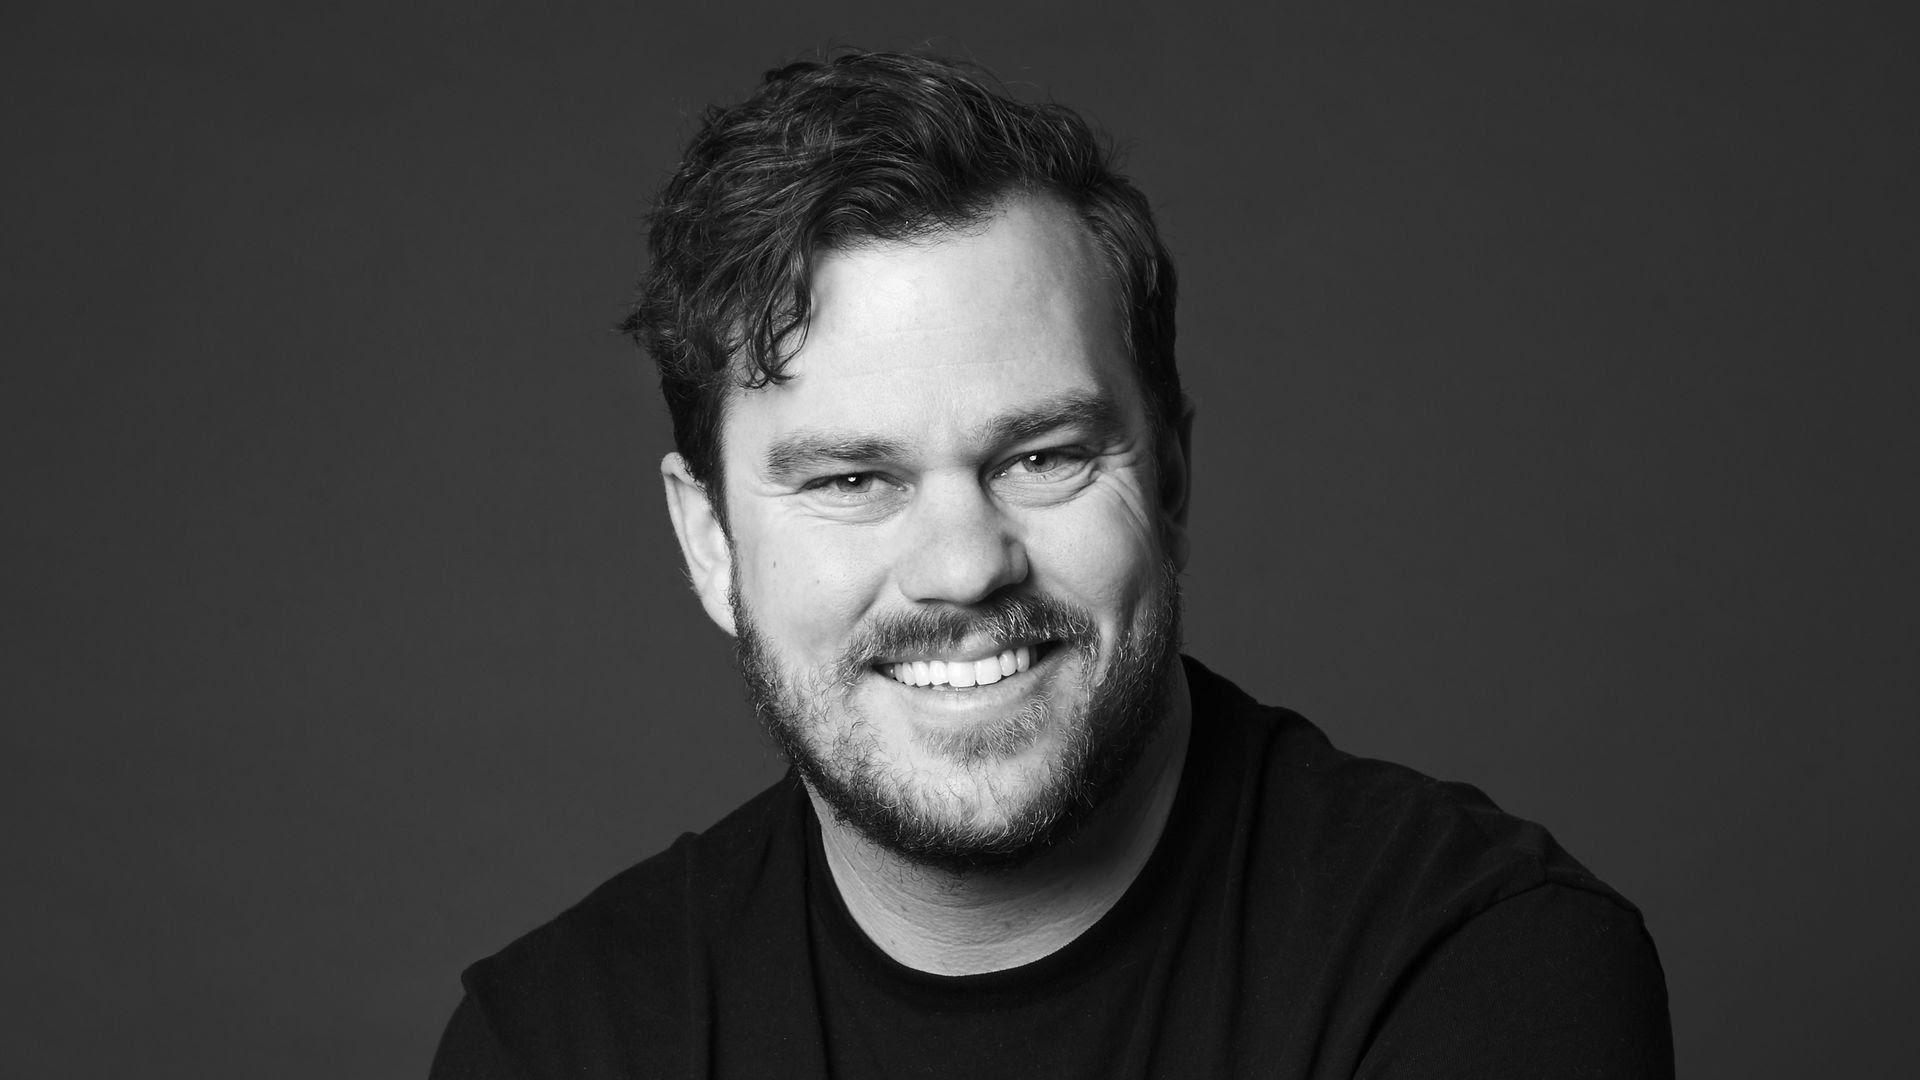 Headshot of Songwriter Ethan Hulse.